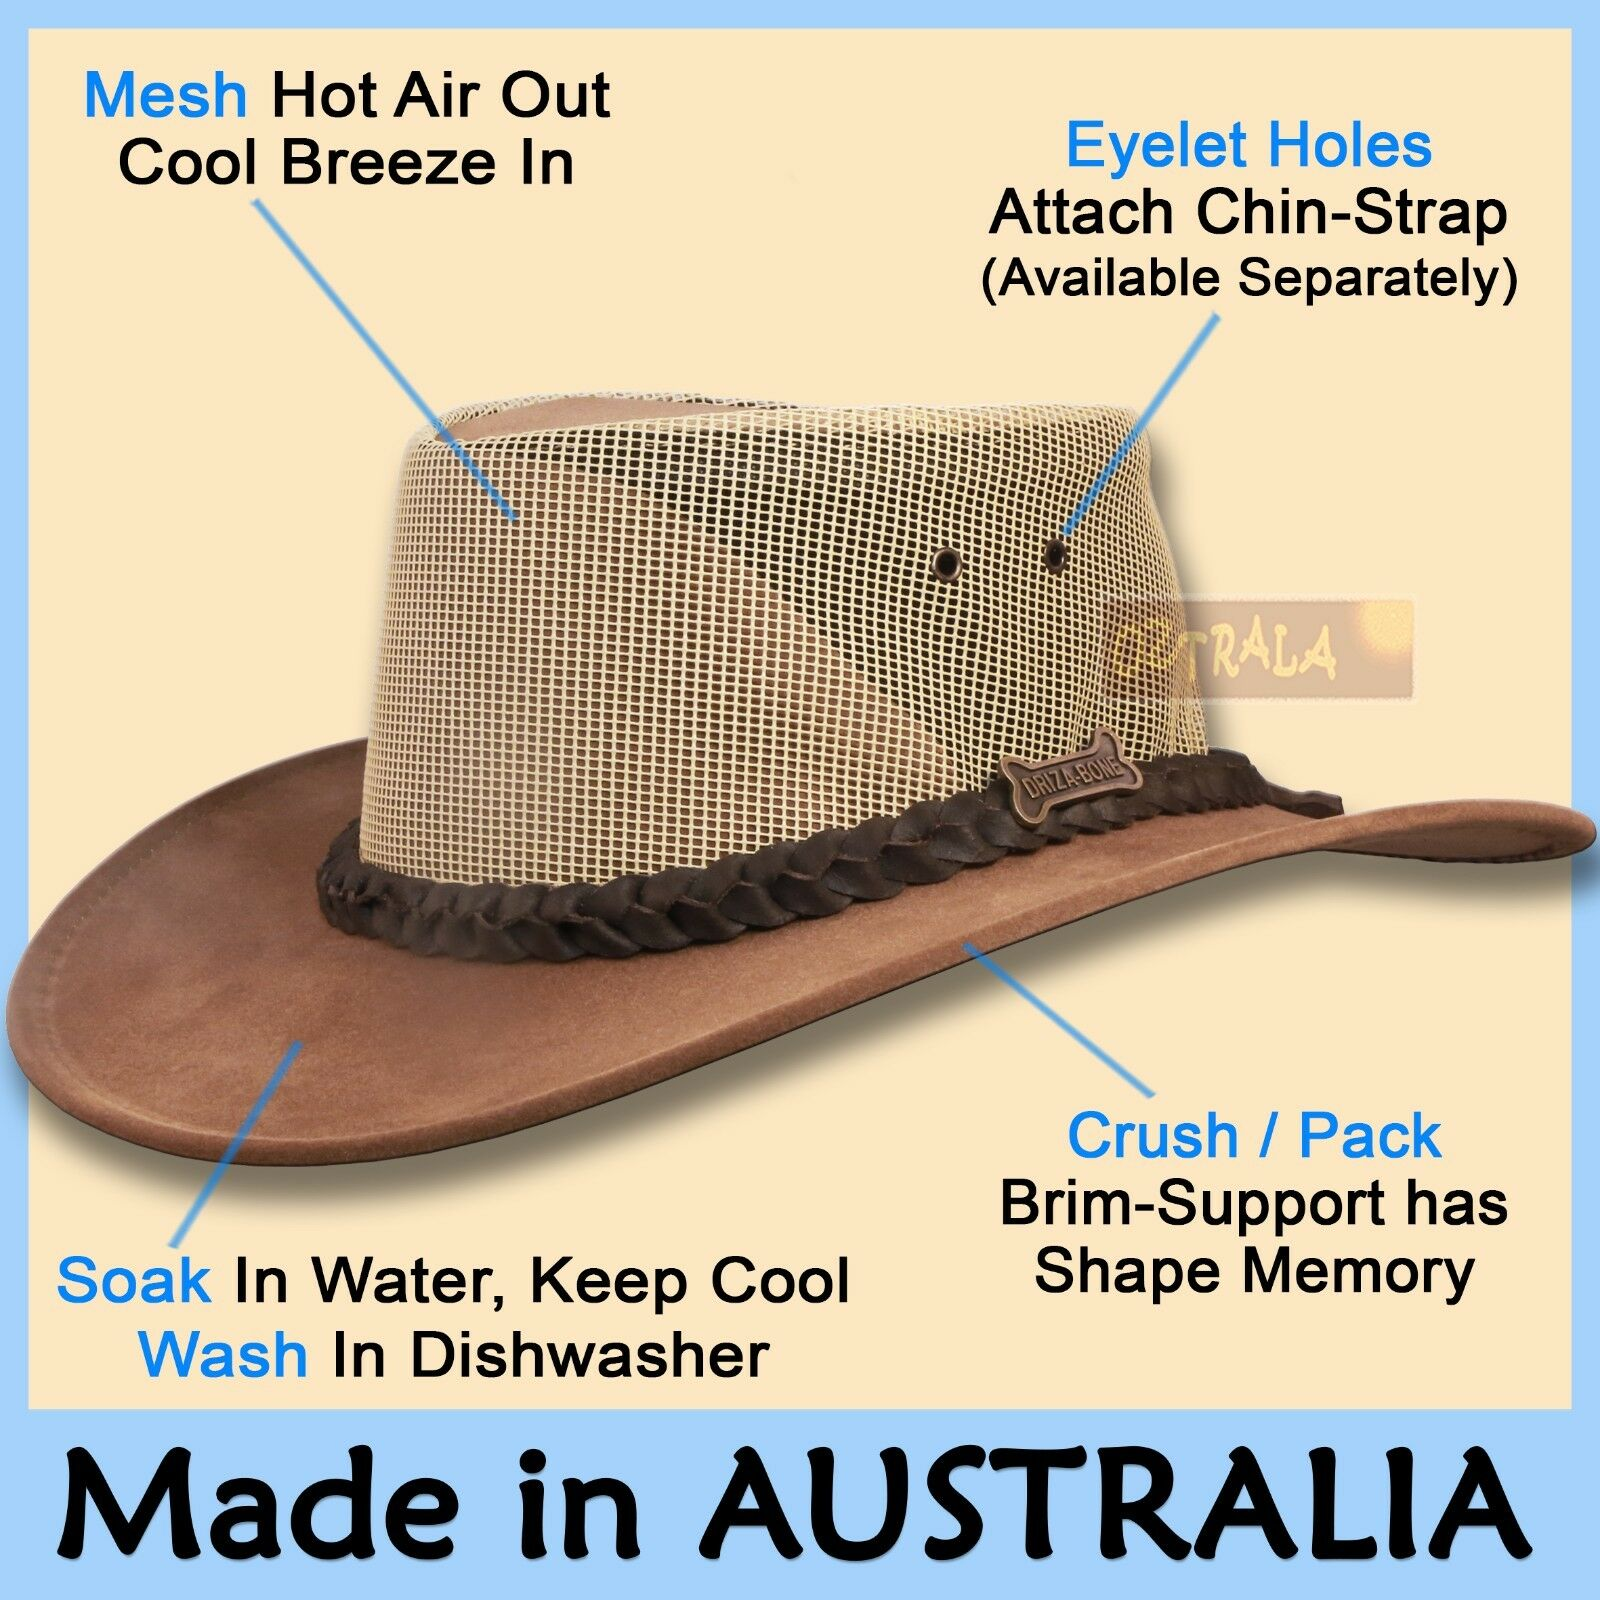 58c3634ed51 Головной убор для мужчины ○oZtrALa○ Driza-Bone Jacaru Hat Pu-Leather Felt  Mens Women AUSTRALIAN Cowboy NEW - 302656219207 - купить на eBay.com (США)  с ...